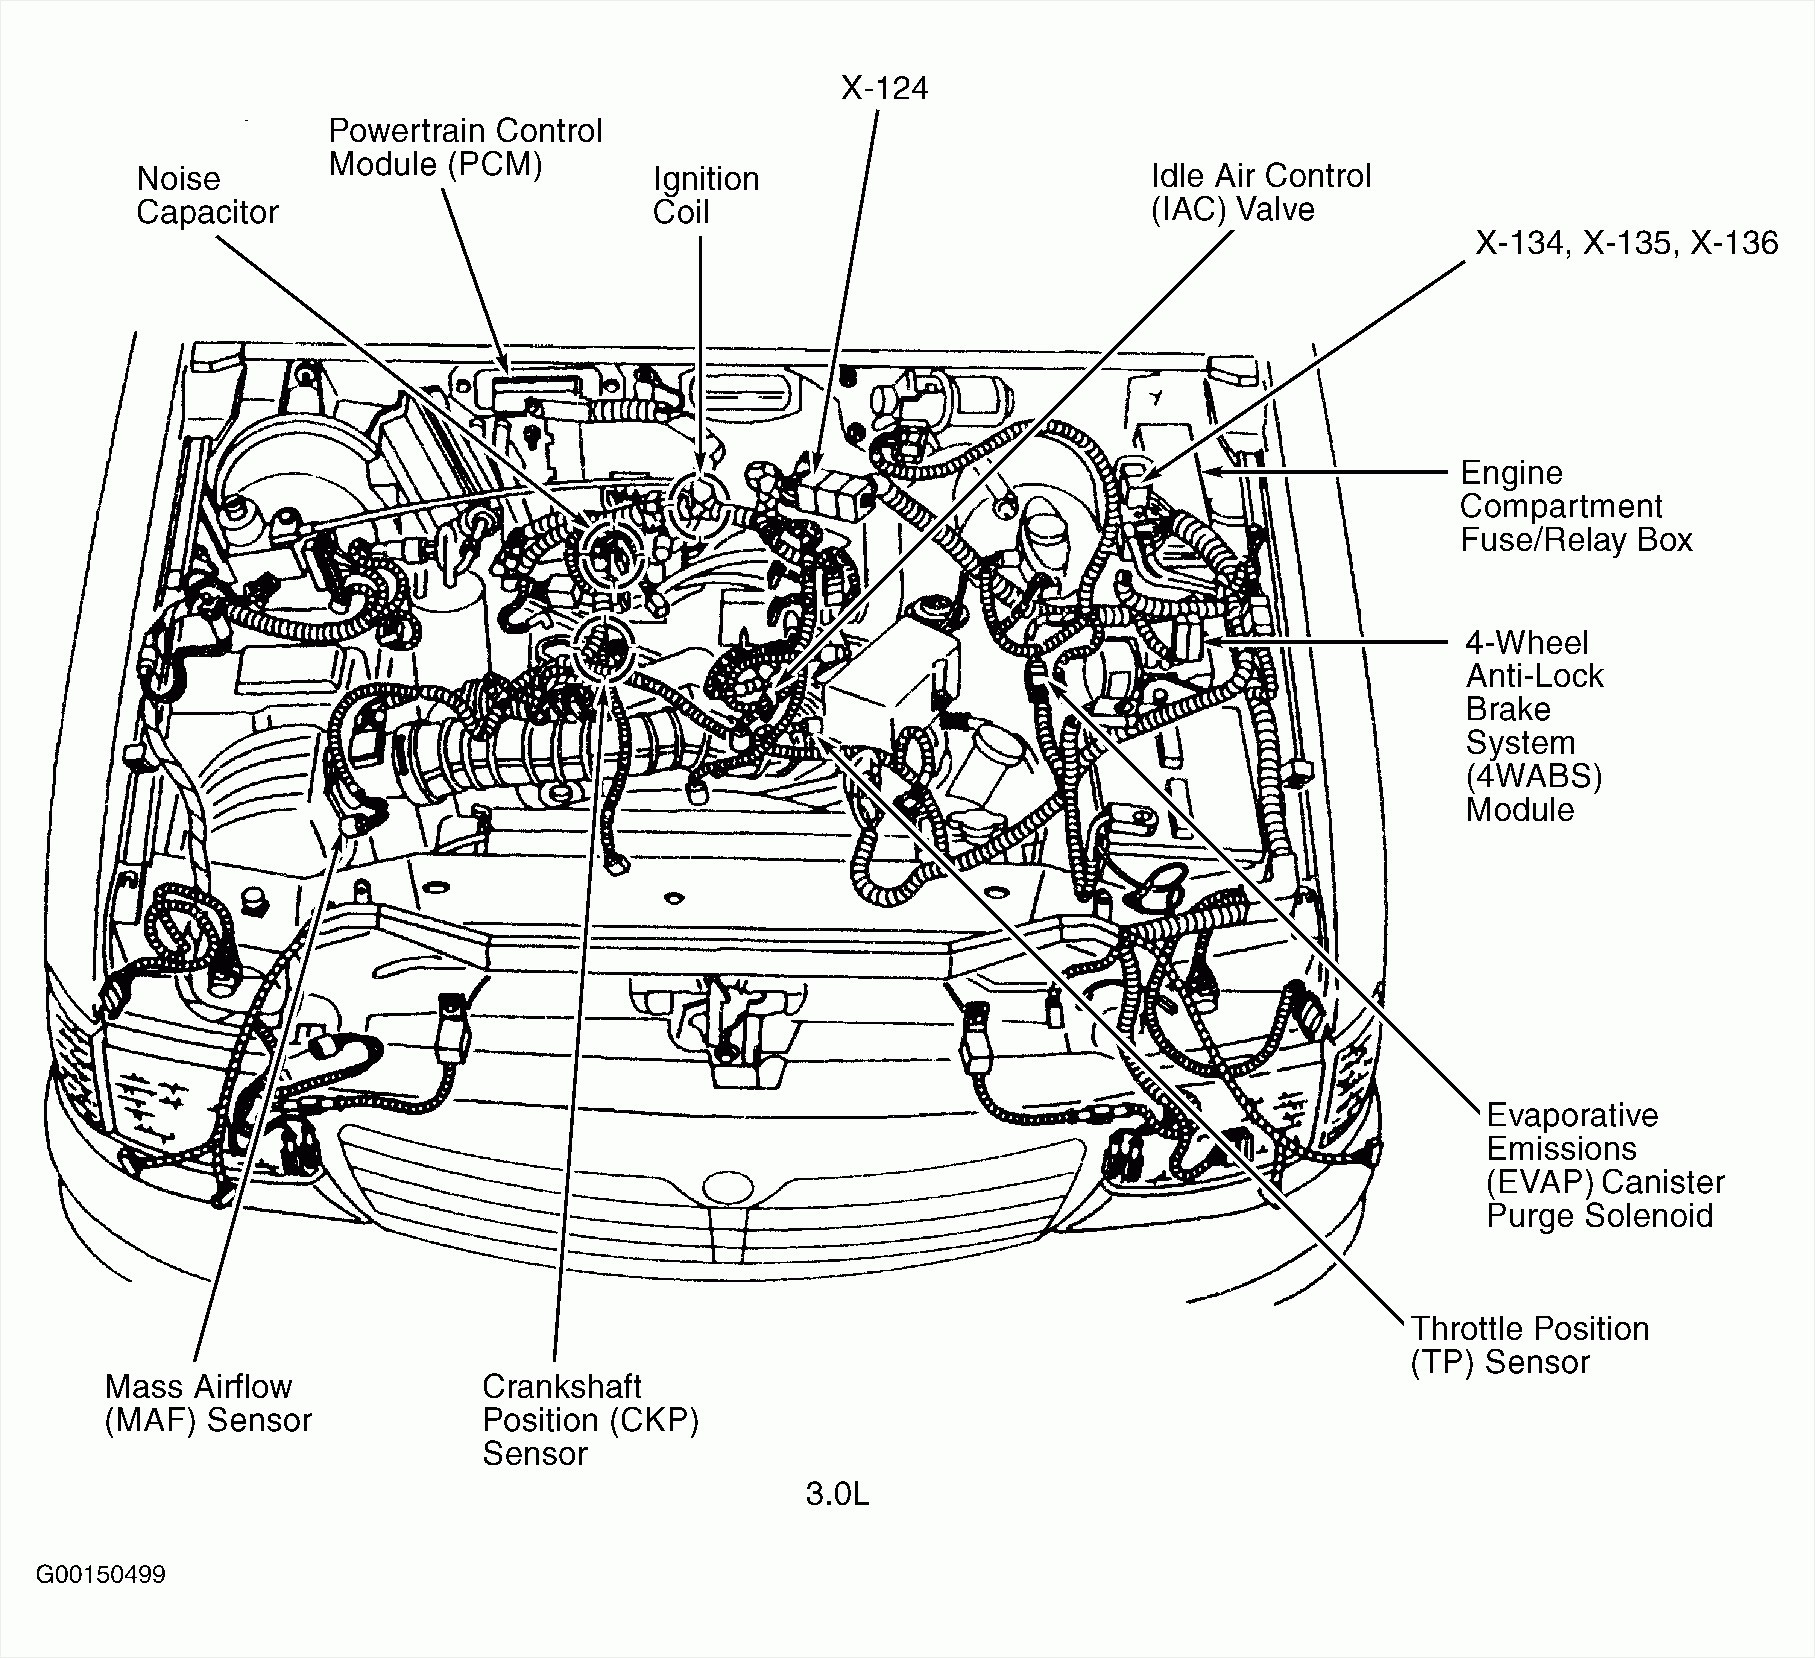 Diagram Of A Diesel Engine Engine Valve Timing Diagram 2004 Mazda 6 V6 Engine Diagram Wiring Of Diagram Of A Diesel Engine